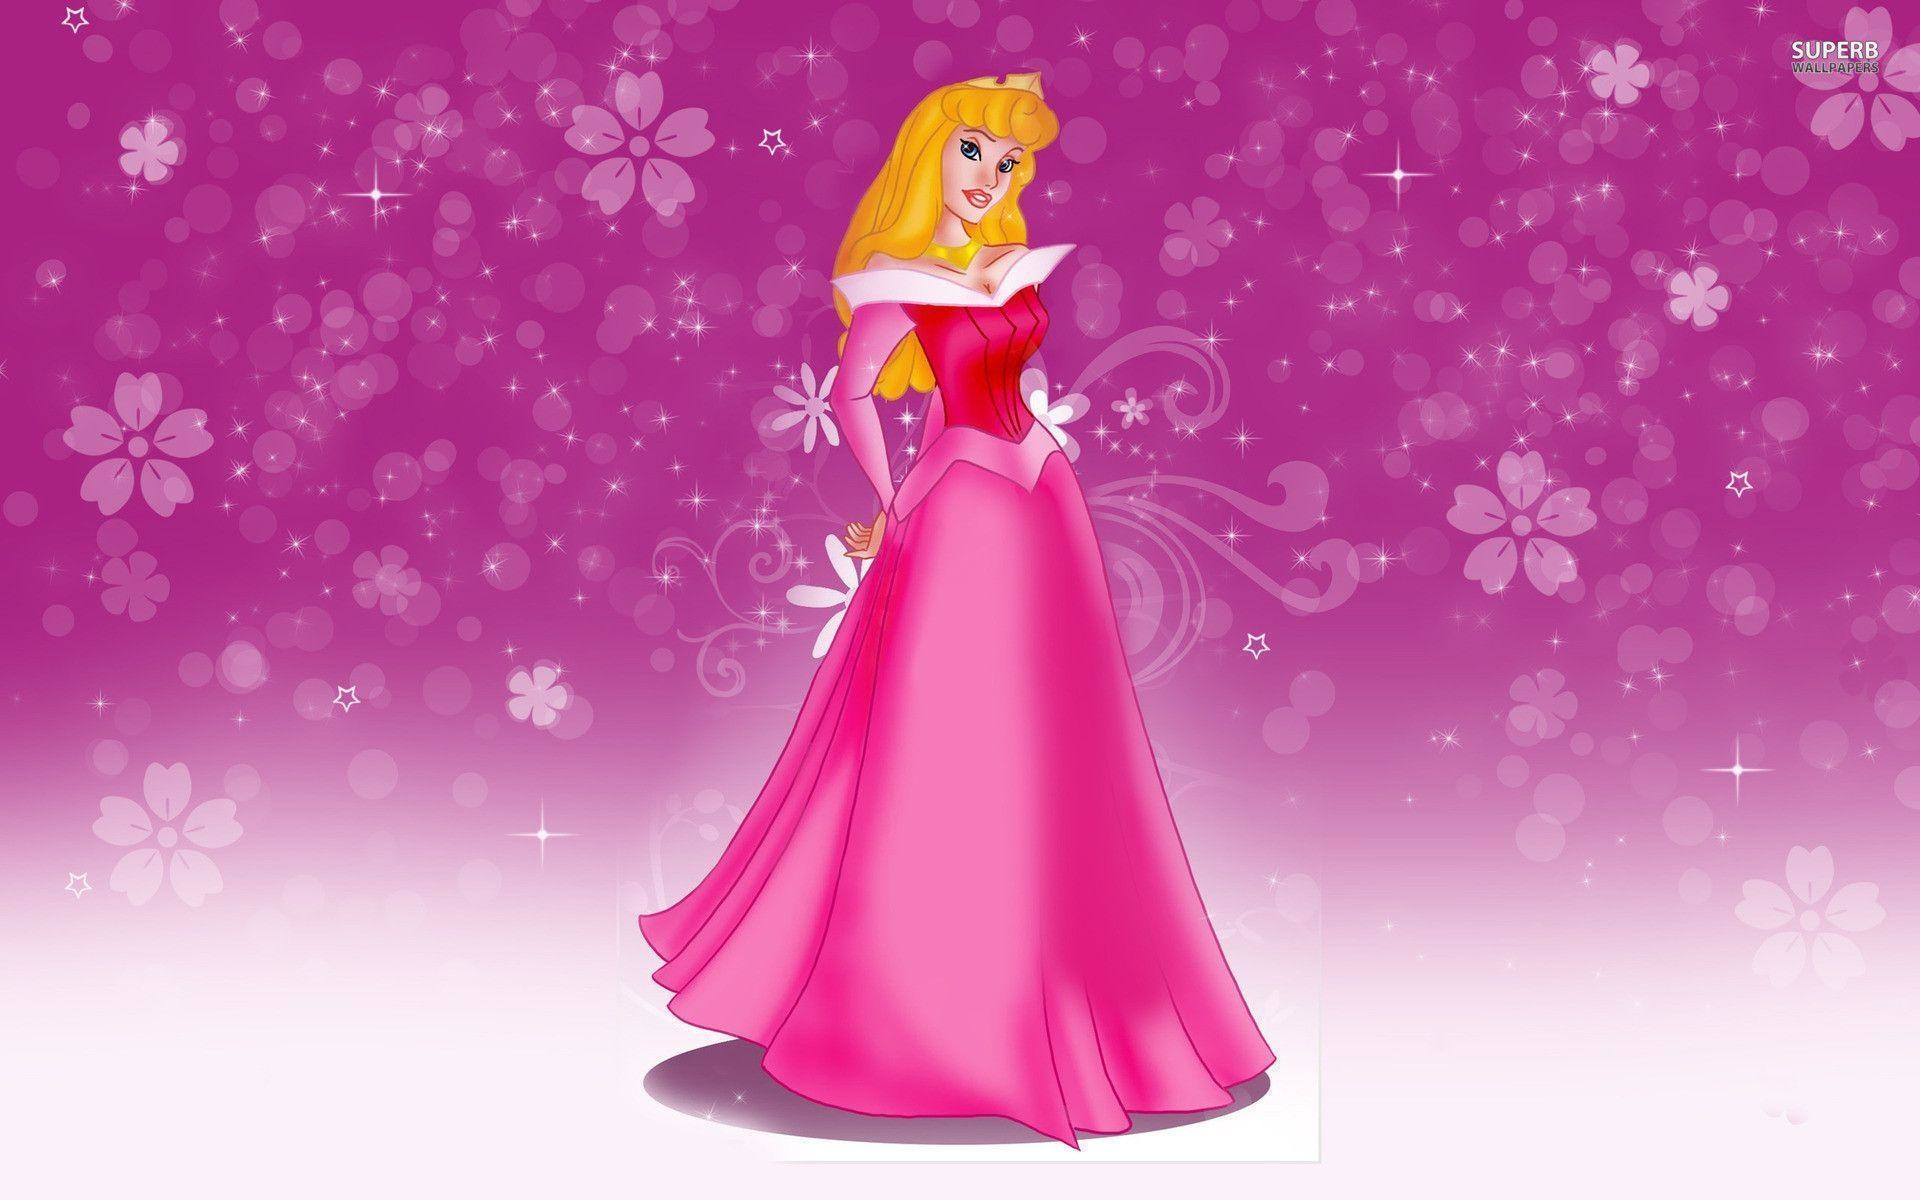 Sleeping Beauty Wallpaper Disney Princess 67 Images